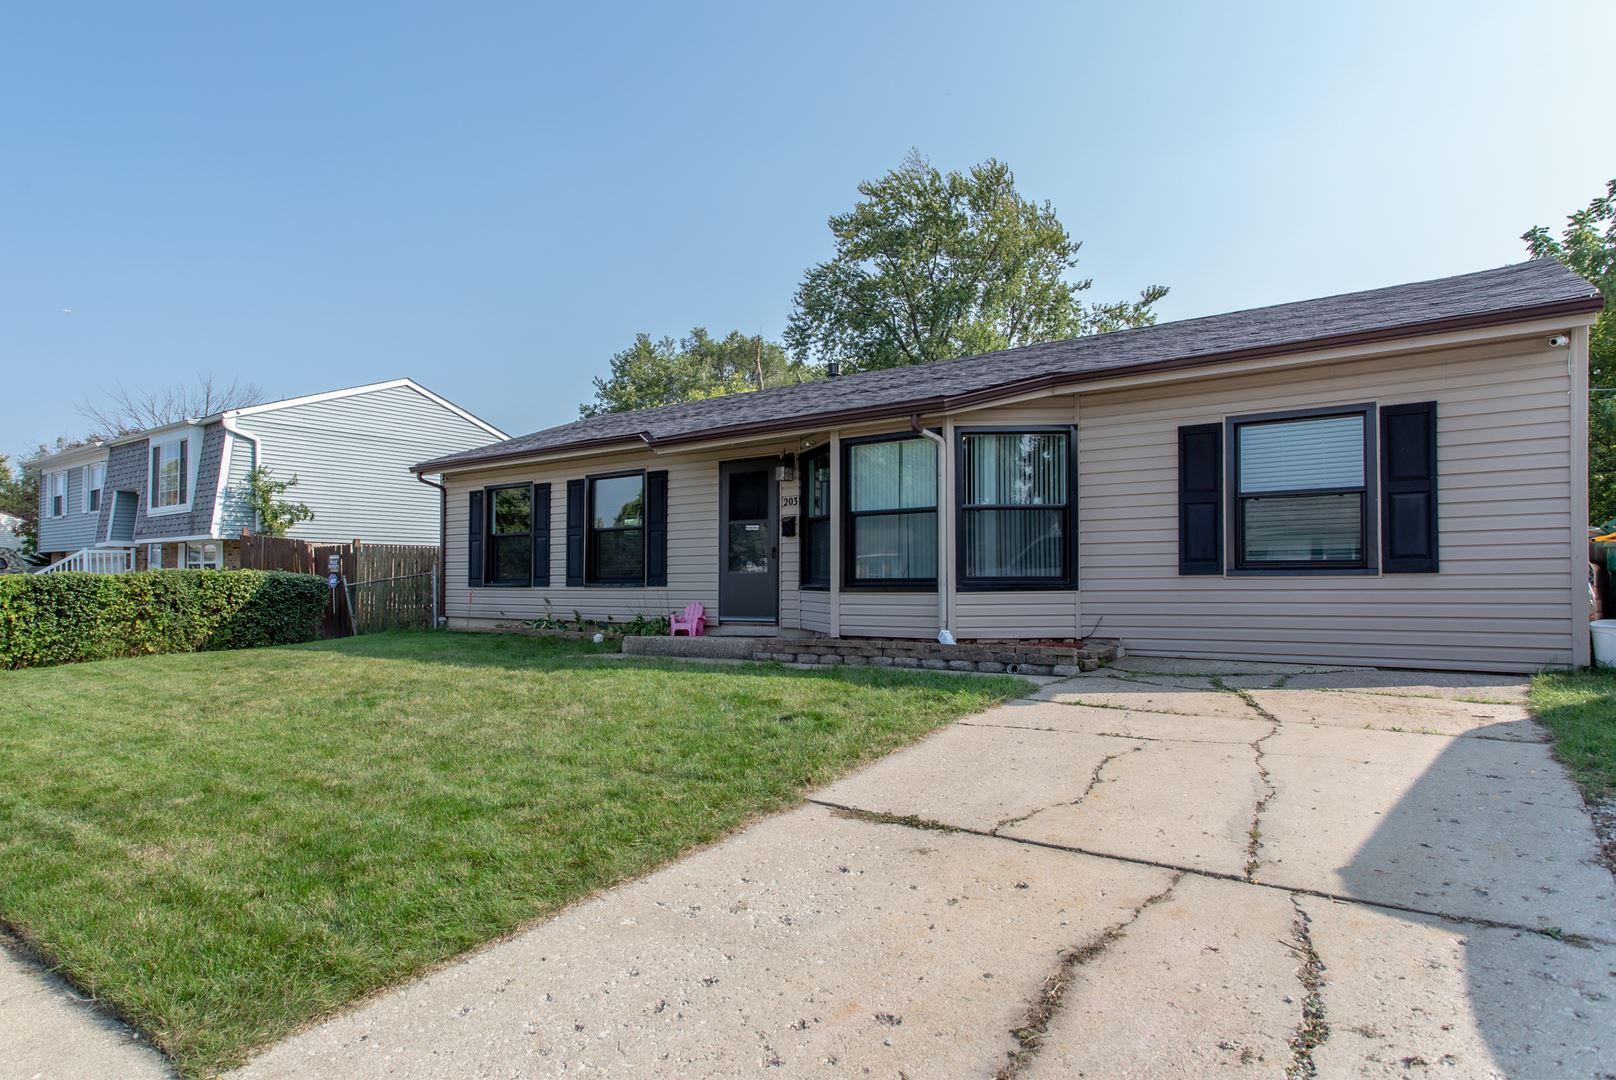 Photo of 203 Murphy Drive, Romeoville, IL 60446 (MLS # 10926666)